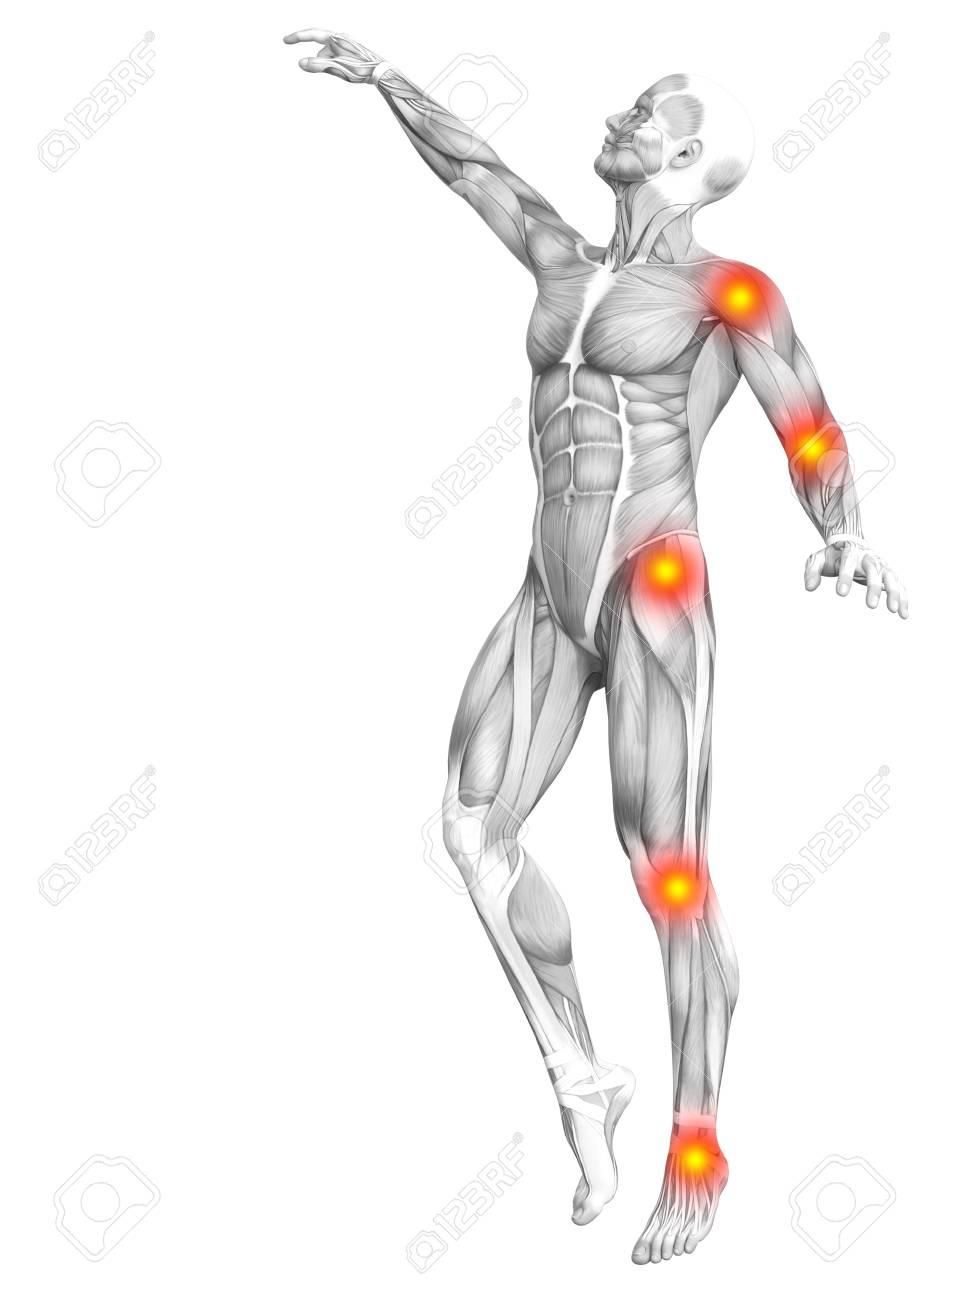 Magnífico Nalgas Humanos Anatomía Modelo - Imágenes de Anatomía ...